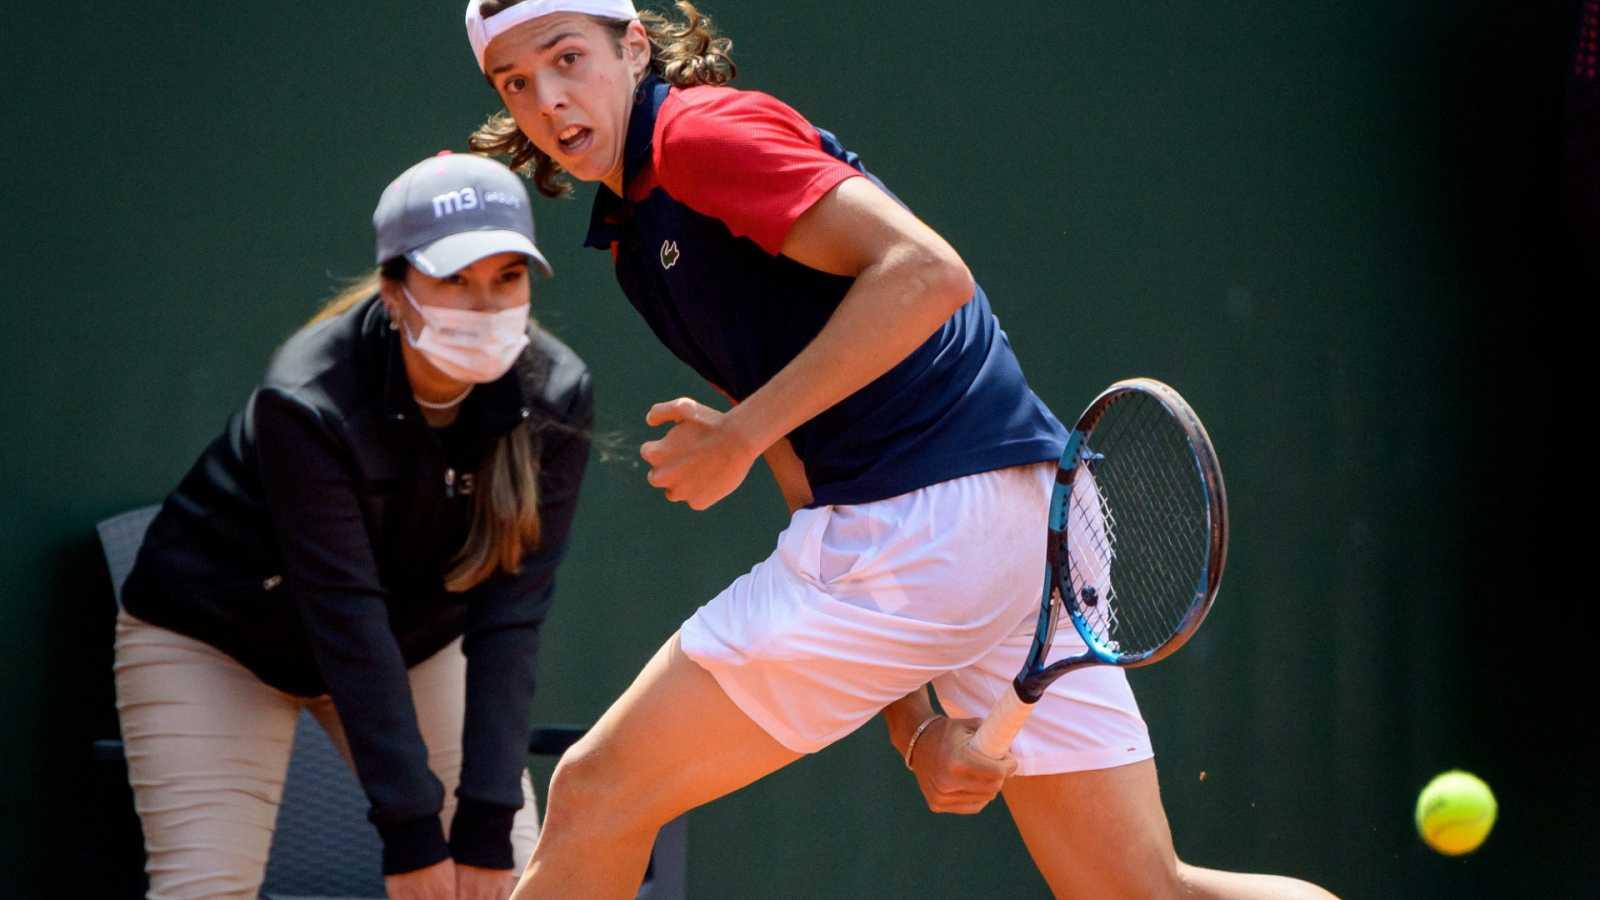 Tenis - ATP 250 Torneo Ginebra: Adrian Mannarino - Arthur Cazaux - ver ahora